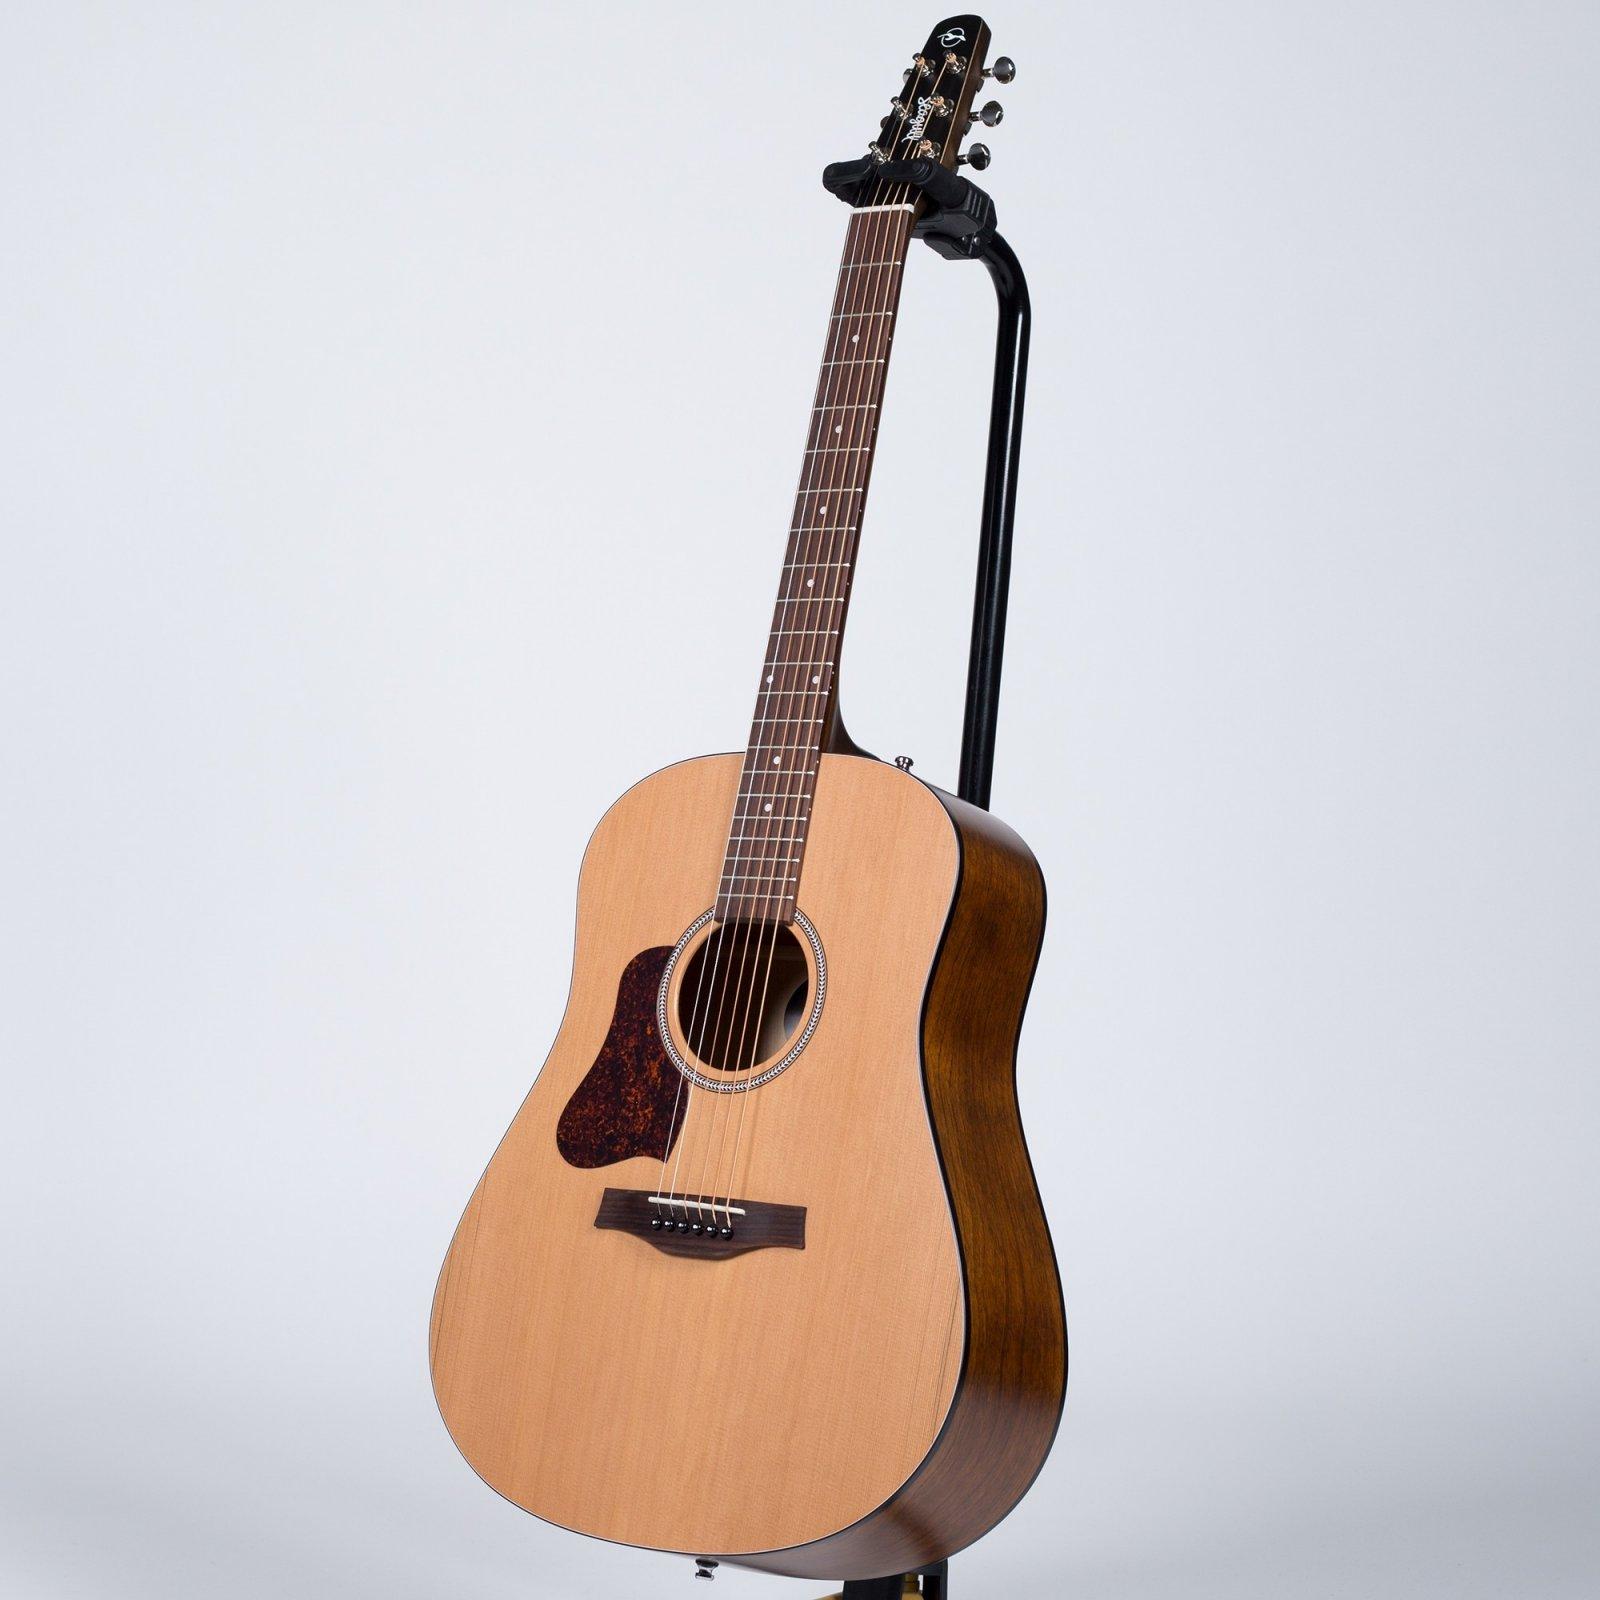 Seagull S6 Original Acoustic Guitar - Left